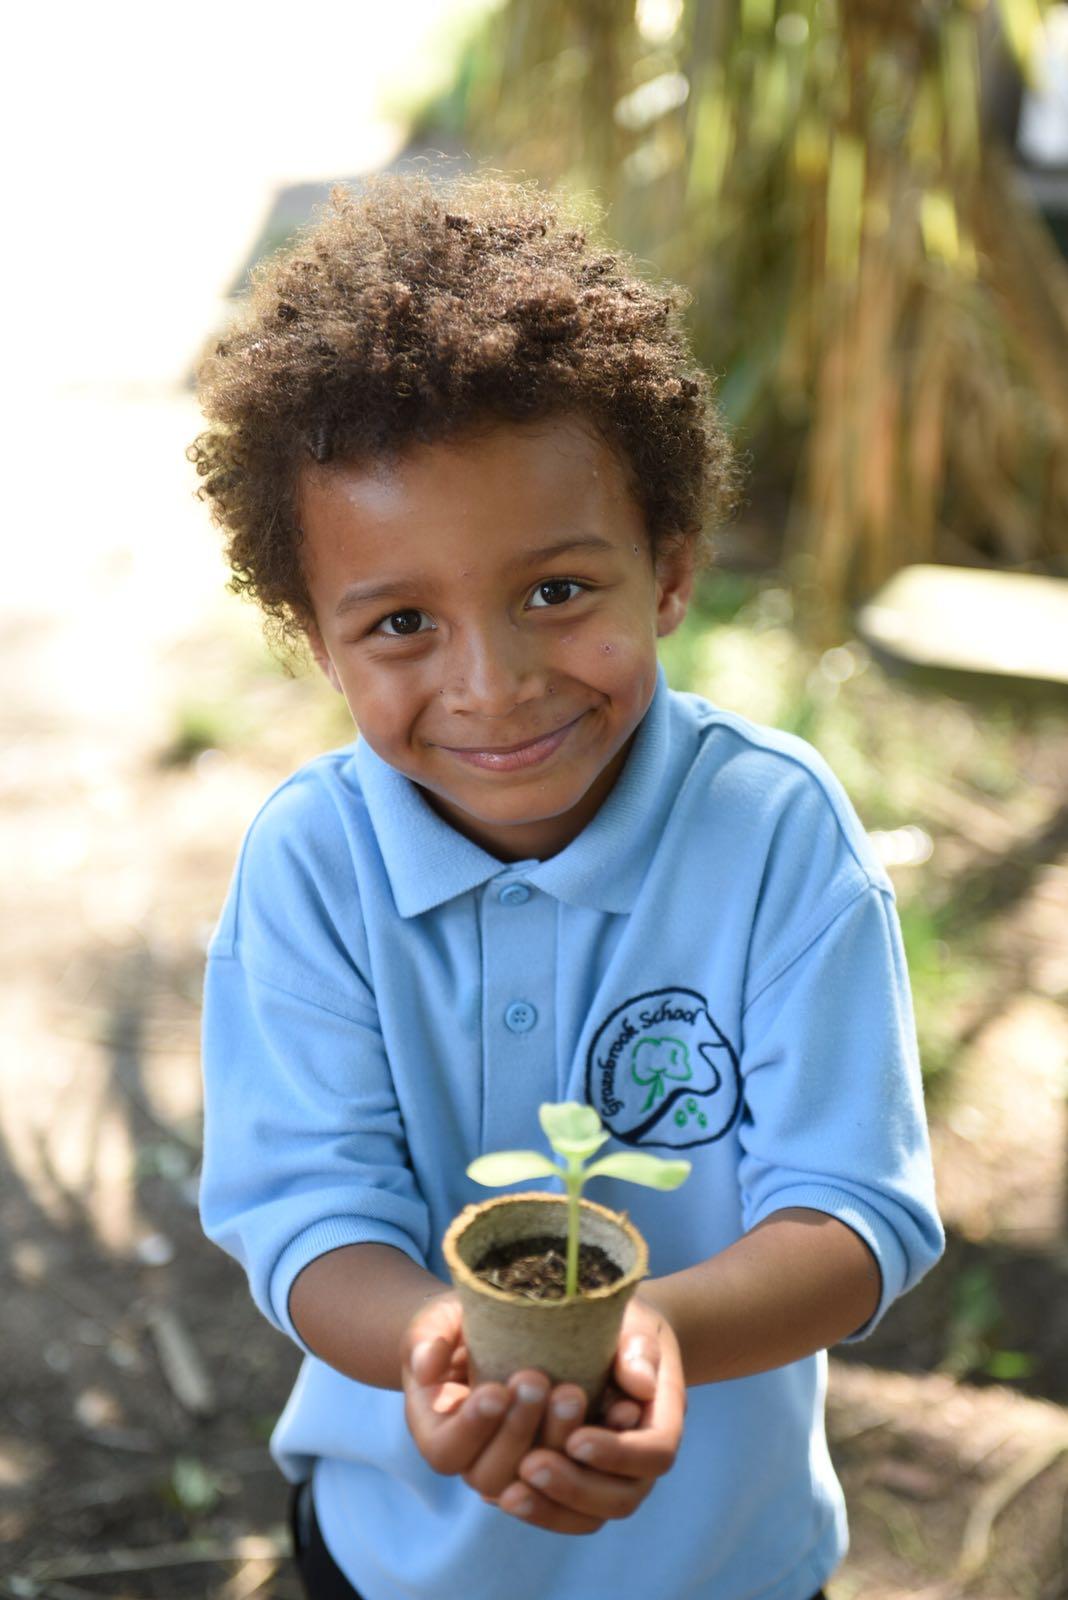 Boy_planter.jpg